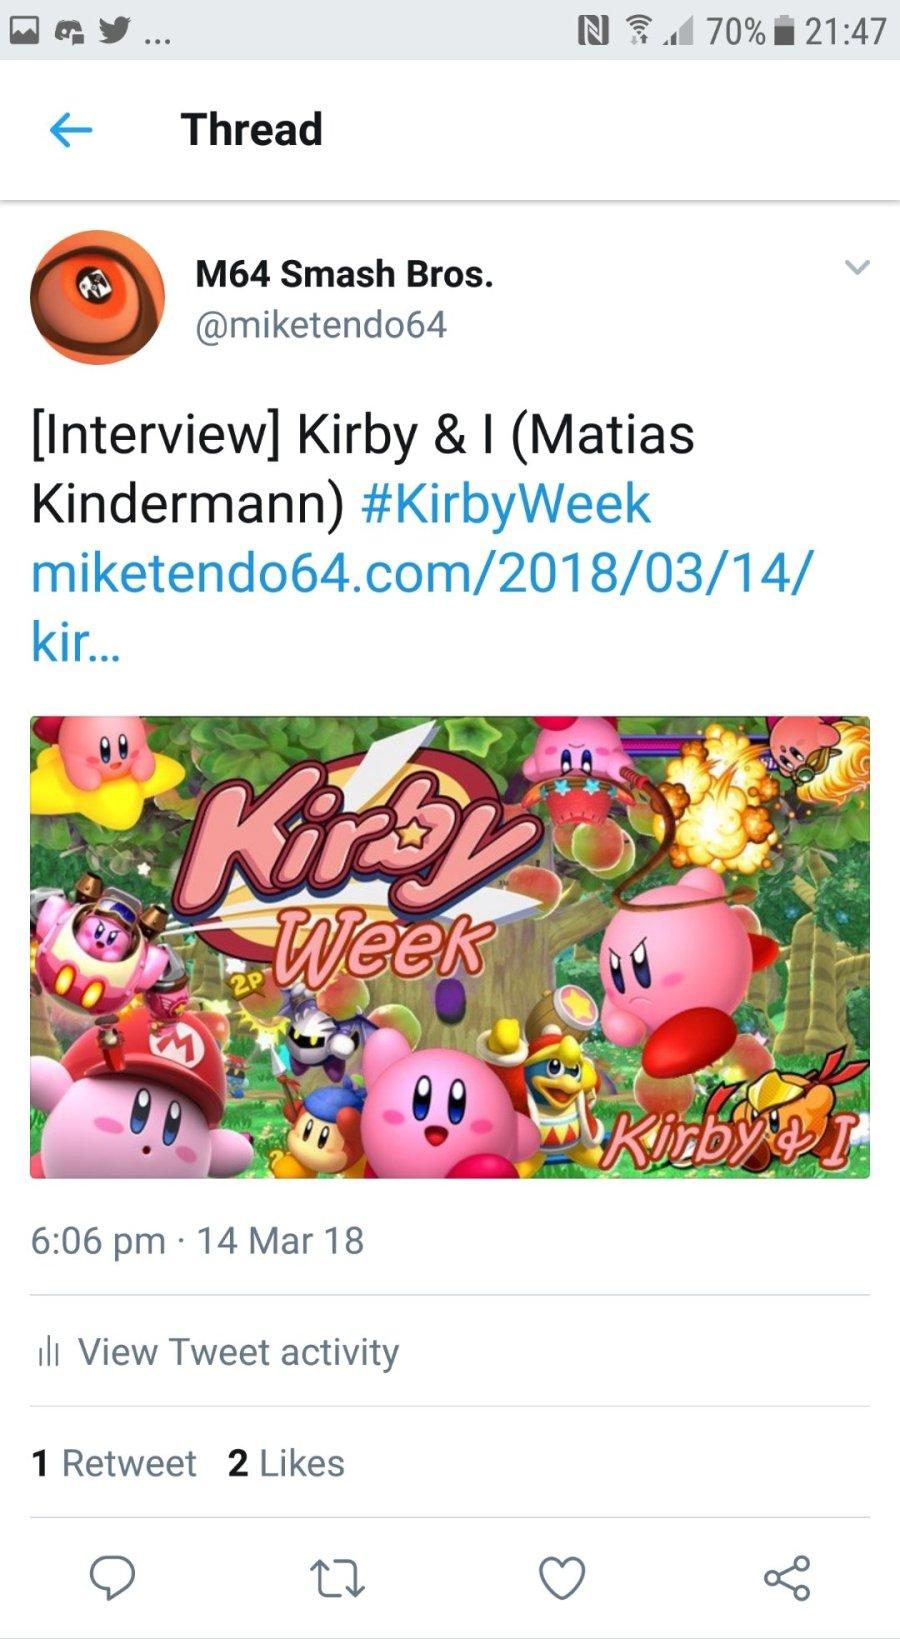 #KirbyWeek: An Interactive Twitter Experience